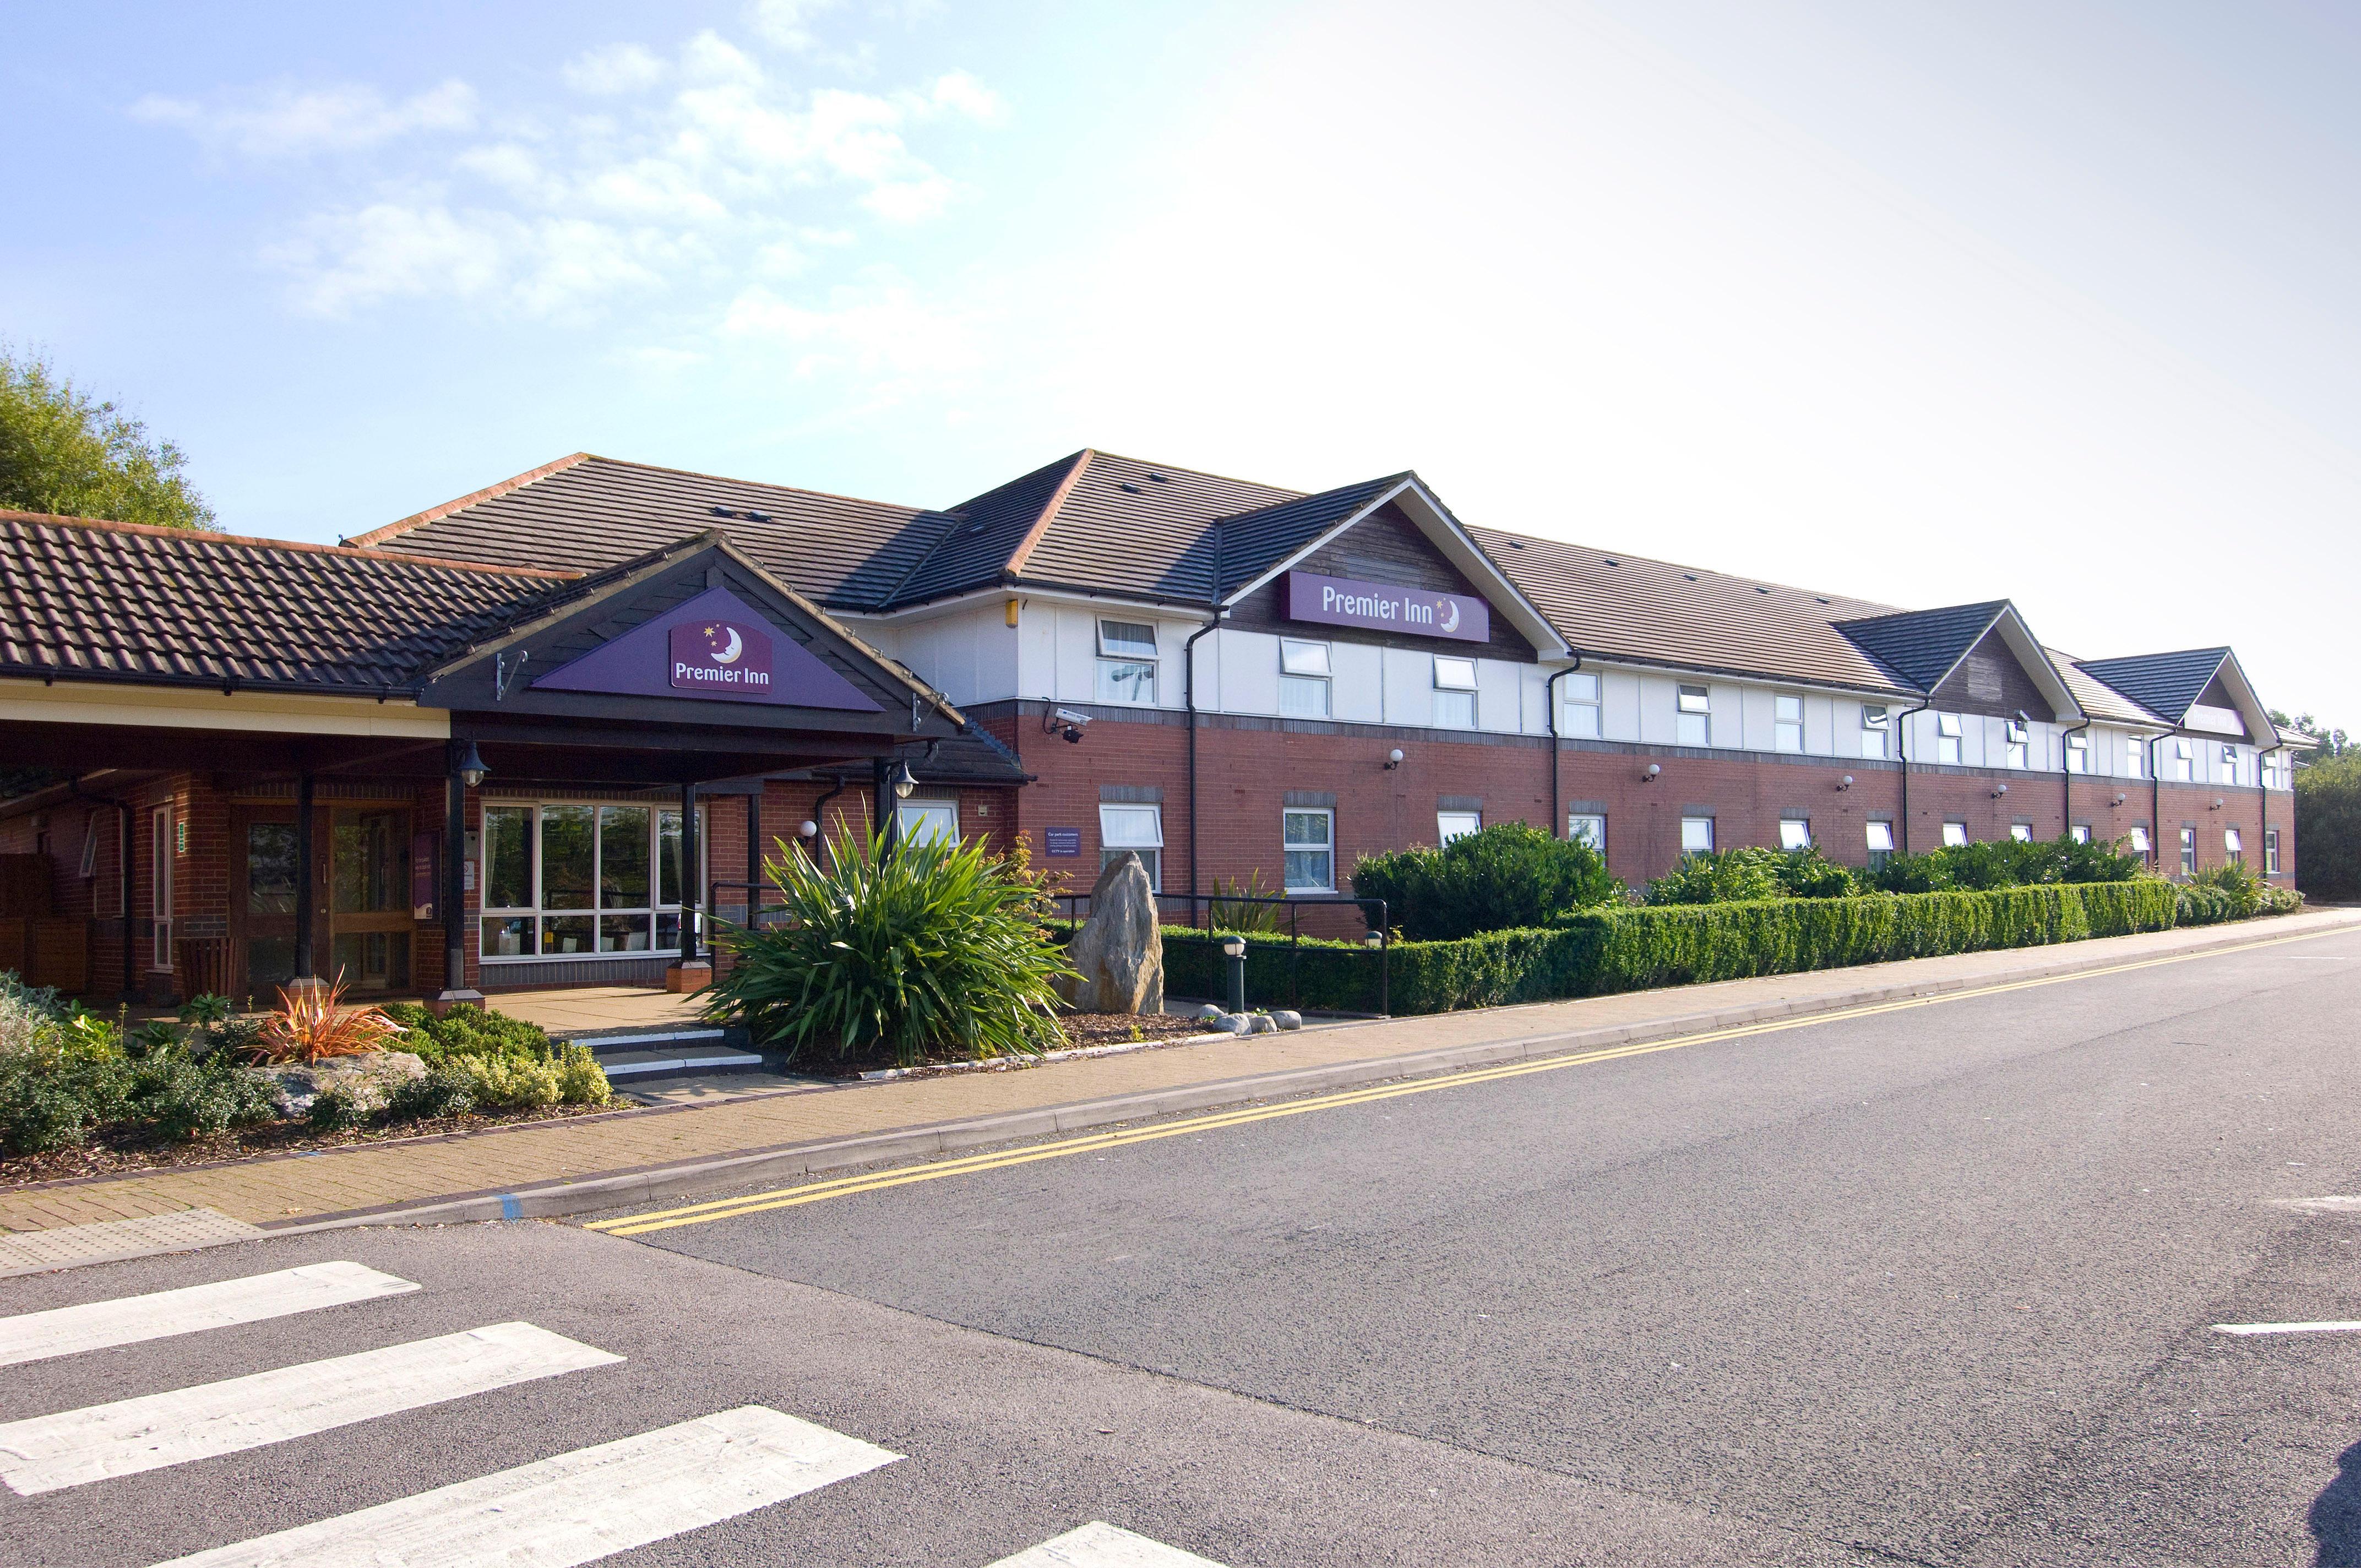 Premier Inn Bristol South hotel